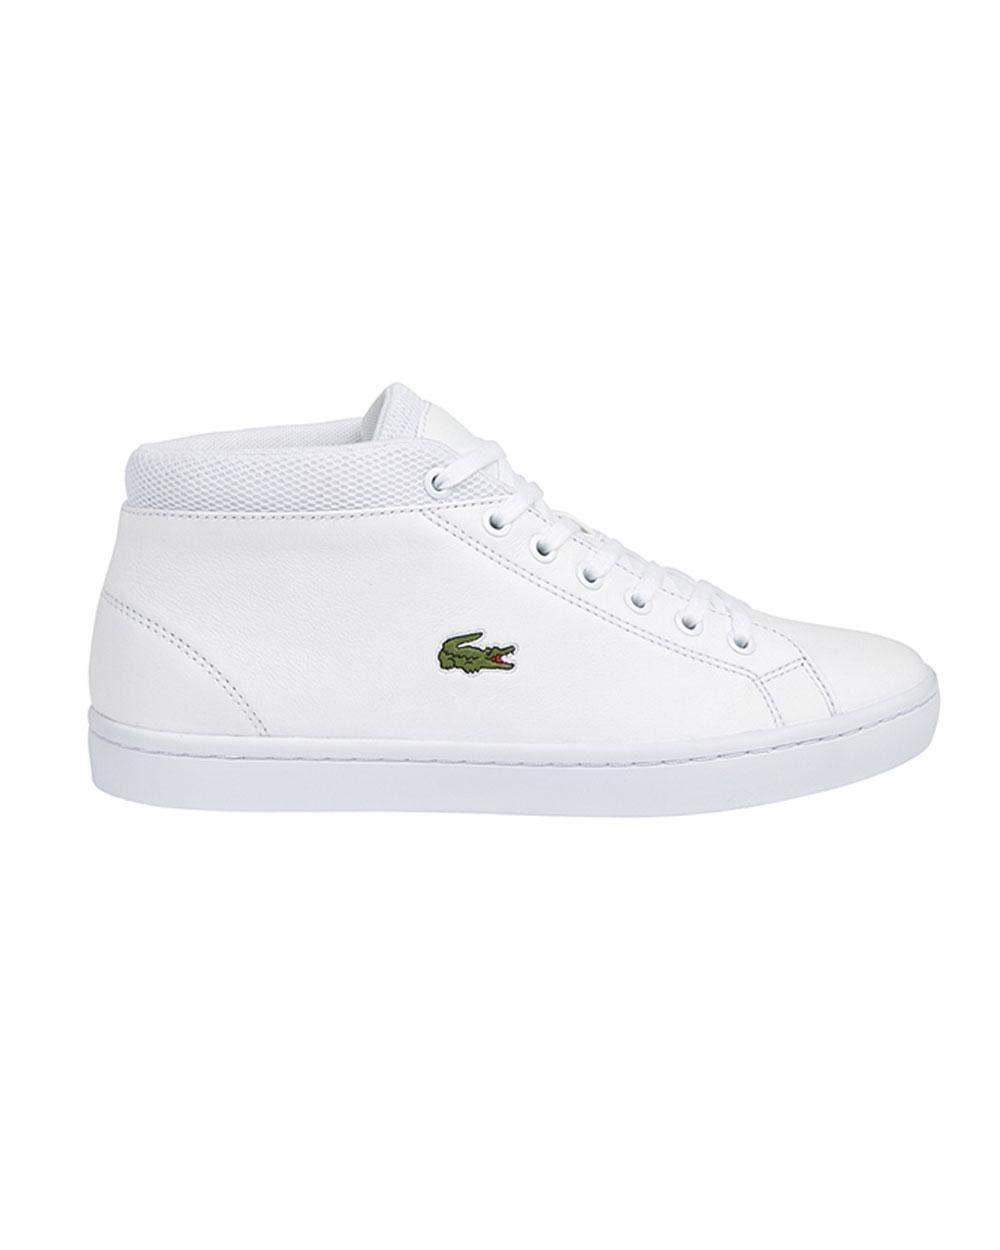 Lacoste Straightset Chukka 316 3 (white)